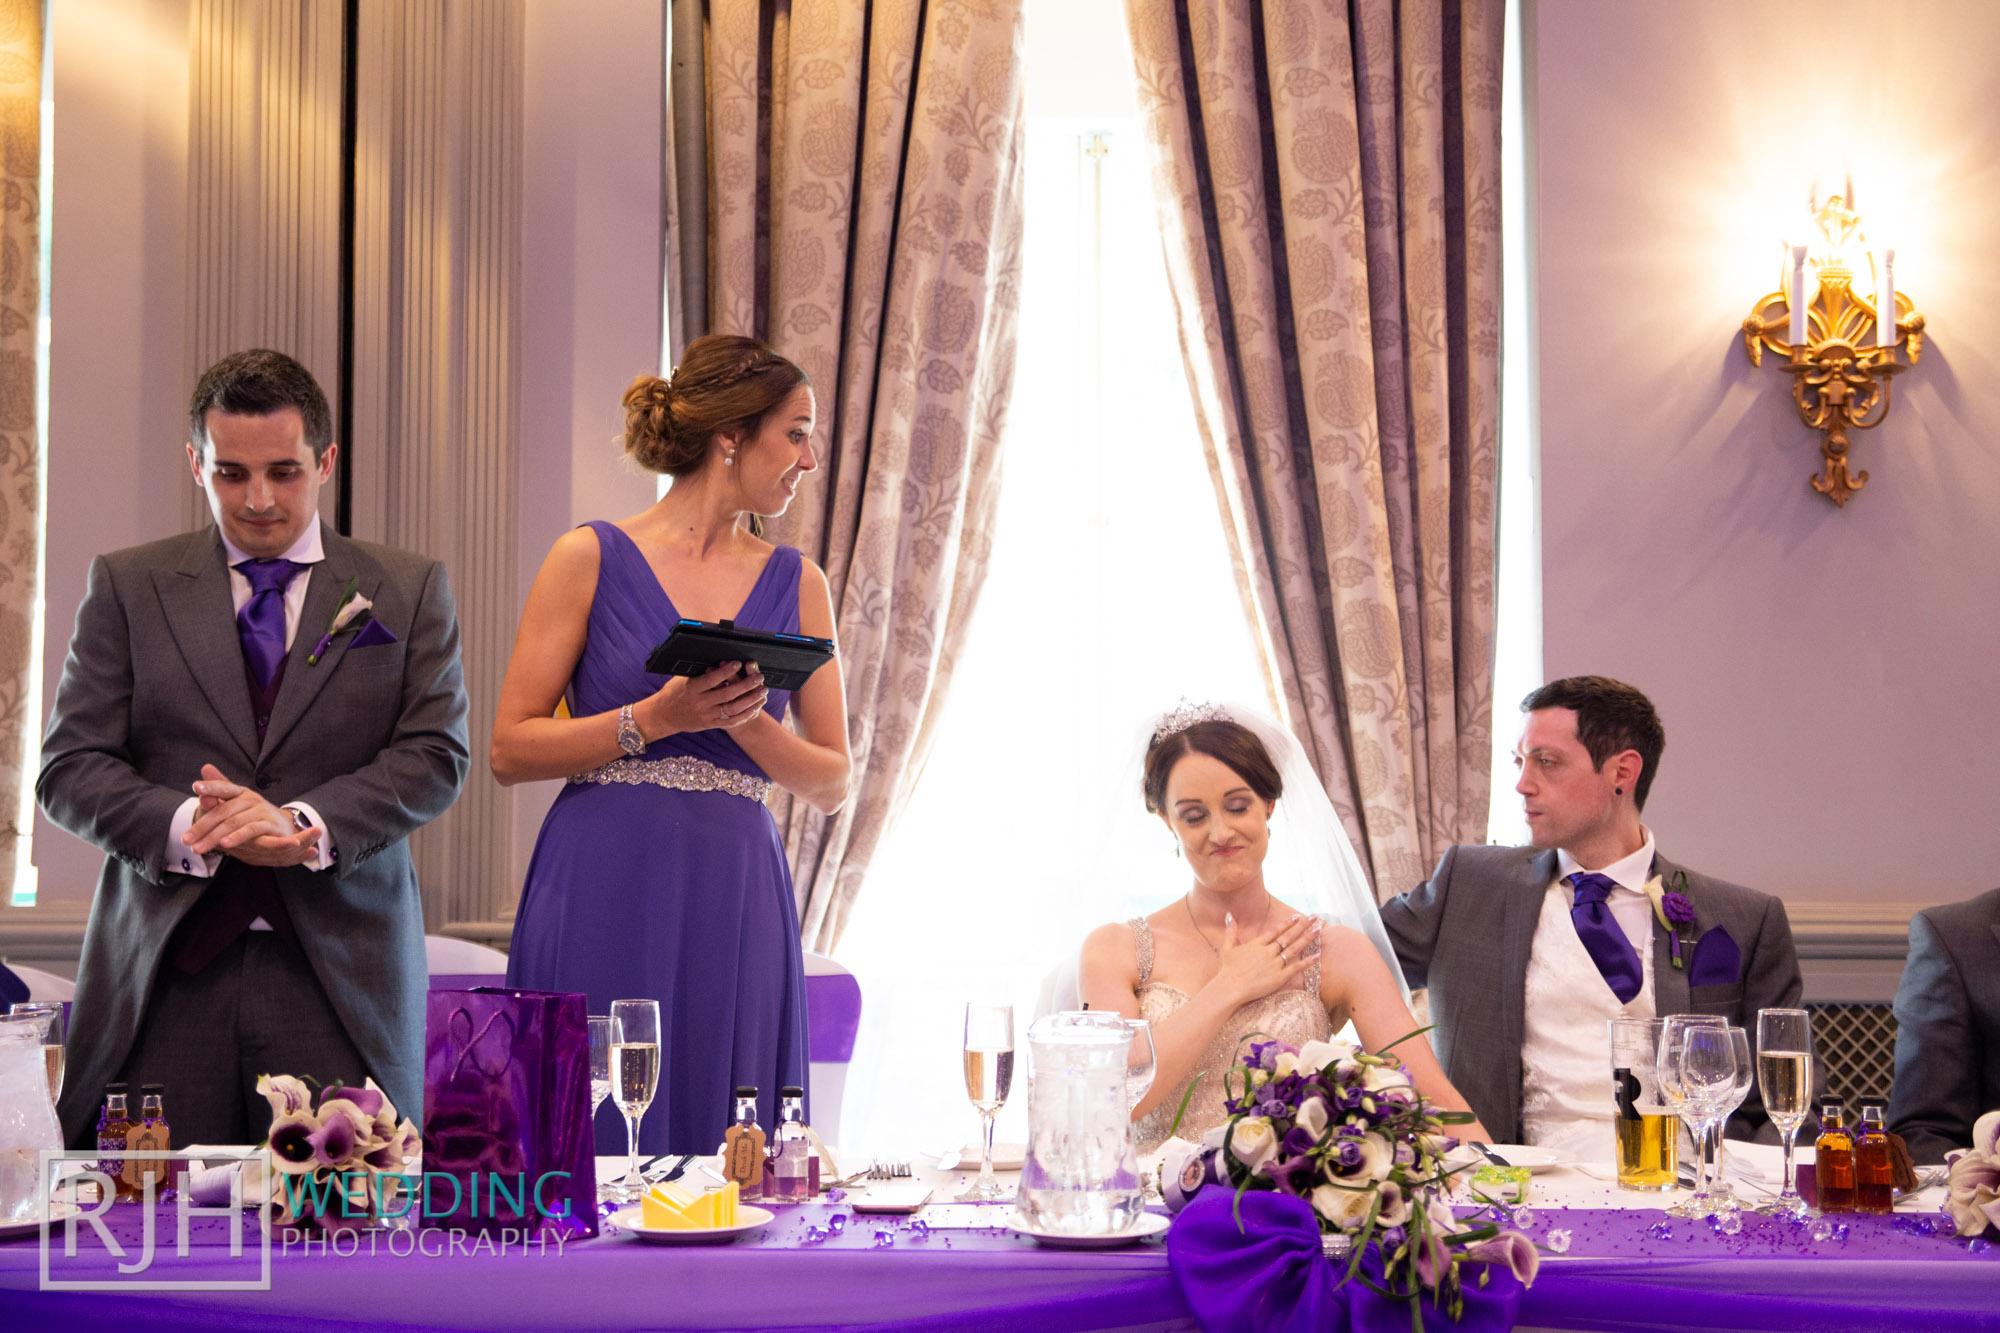 Oulton Hall Wedding Photography_Goodwill-Hall_036_IMG_6776.jpg